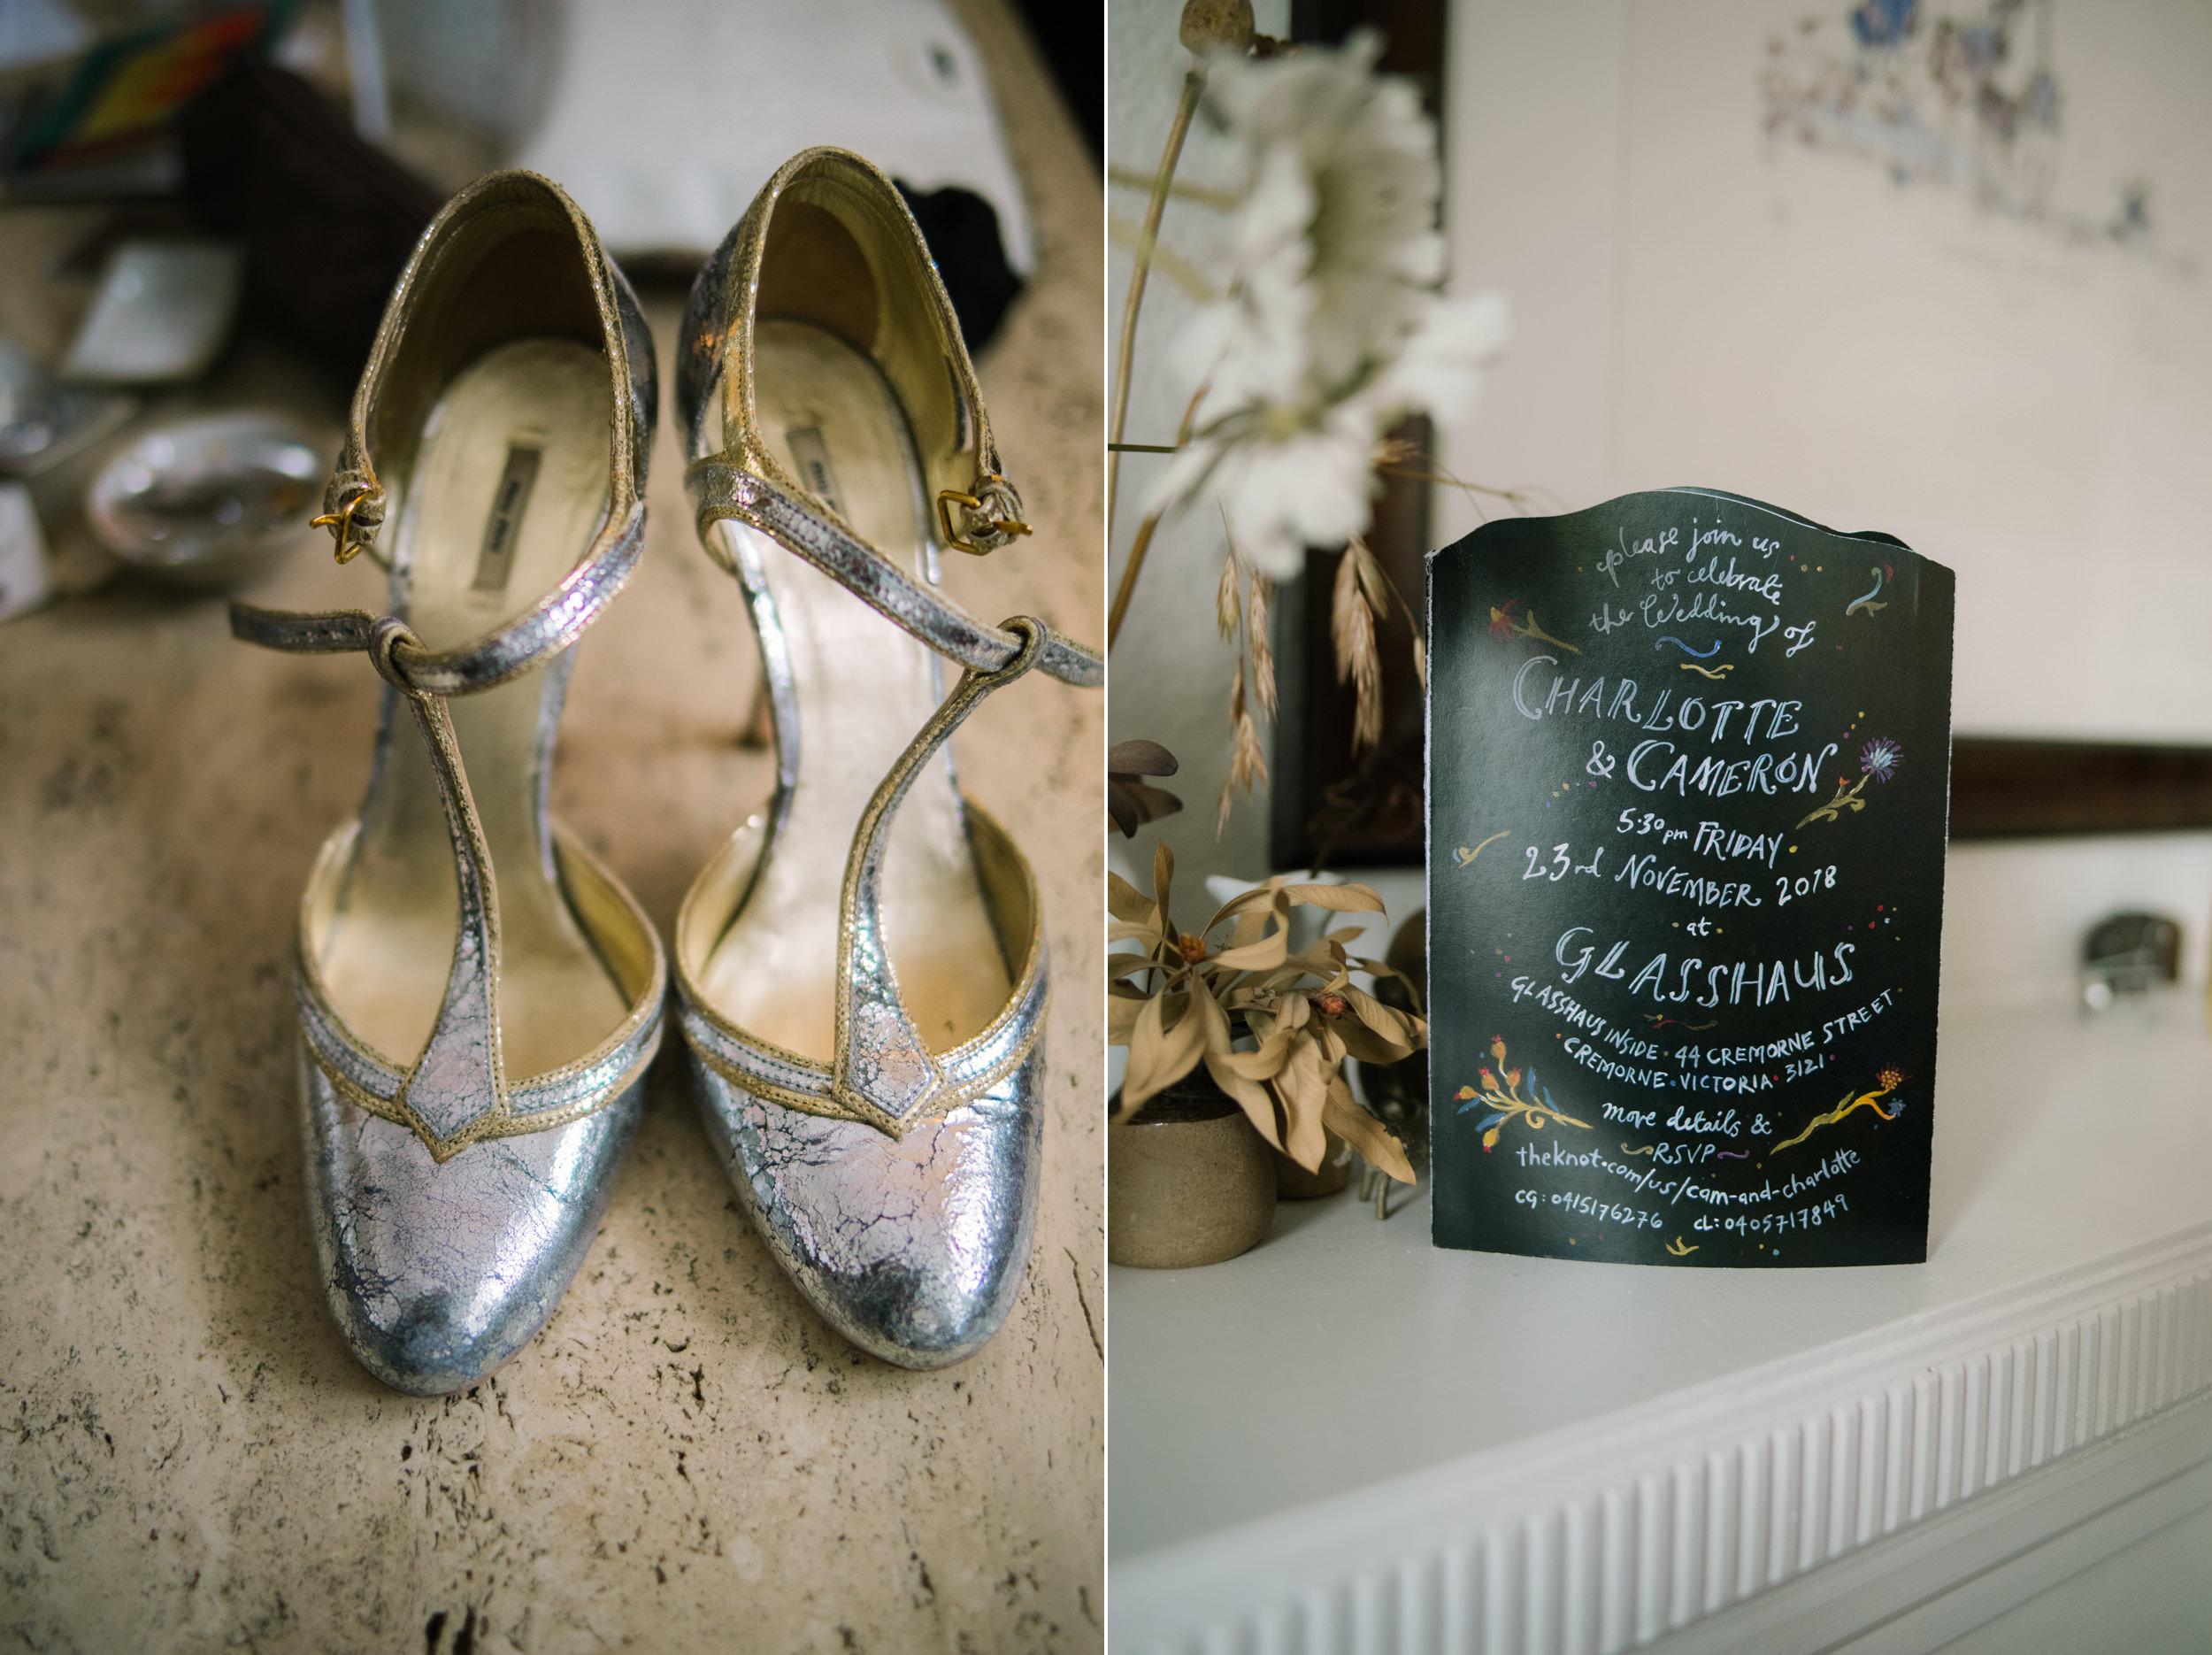 I-Got-You-Babe-&.Co.-Glasshaus-Wedding-Charlotte-Cameron0011.JPG